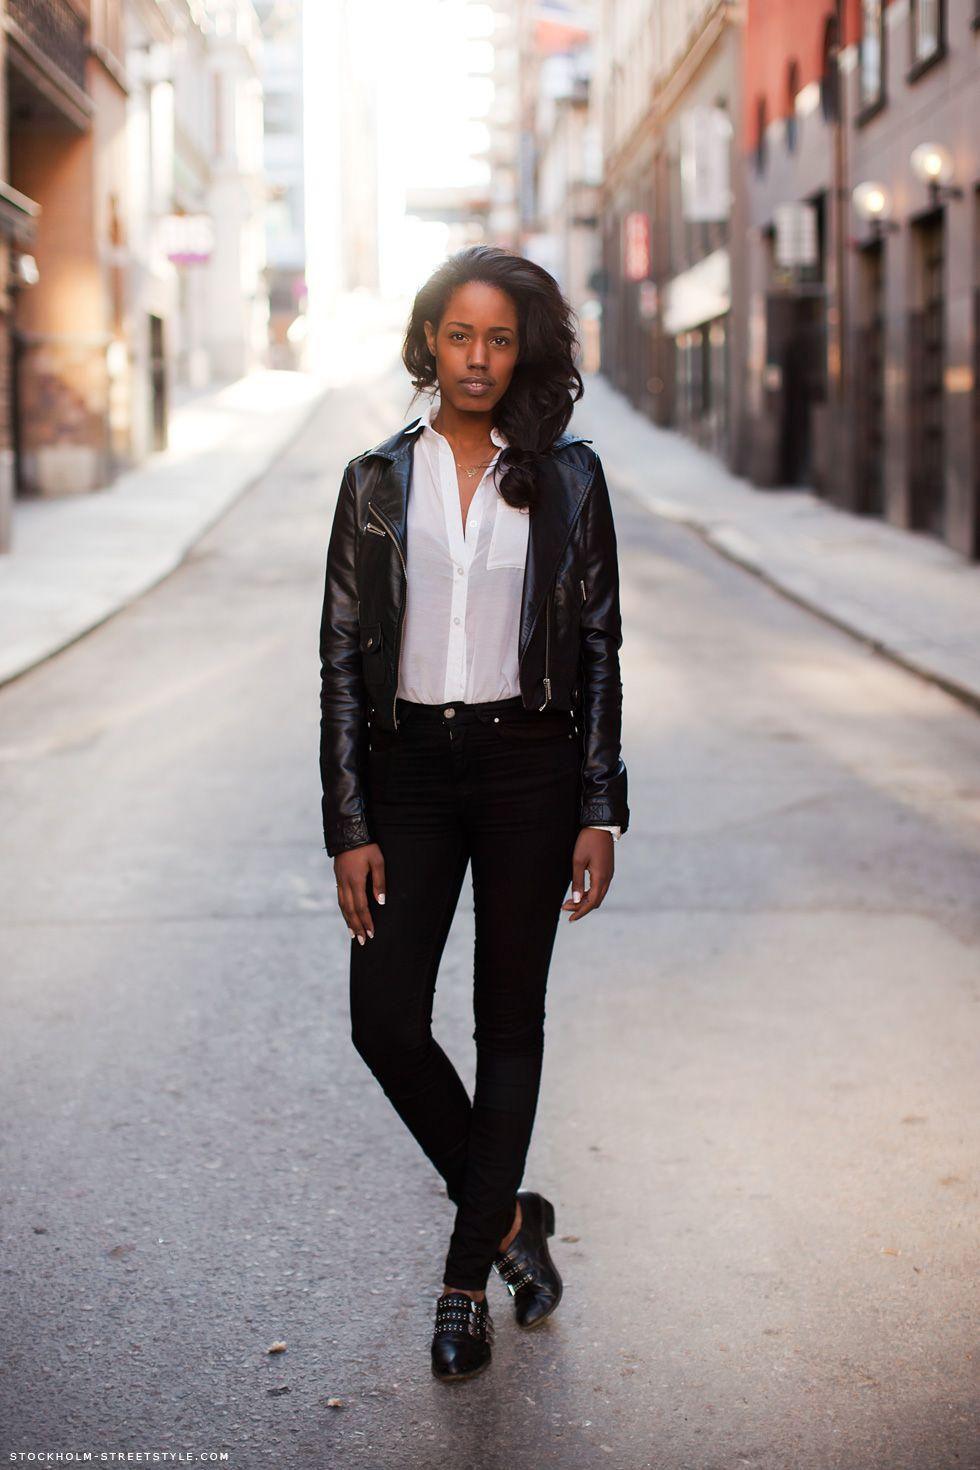 black leather jacket, white shirt, black shoes, jeans ...